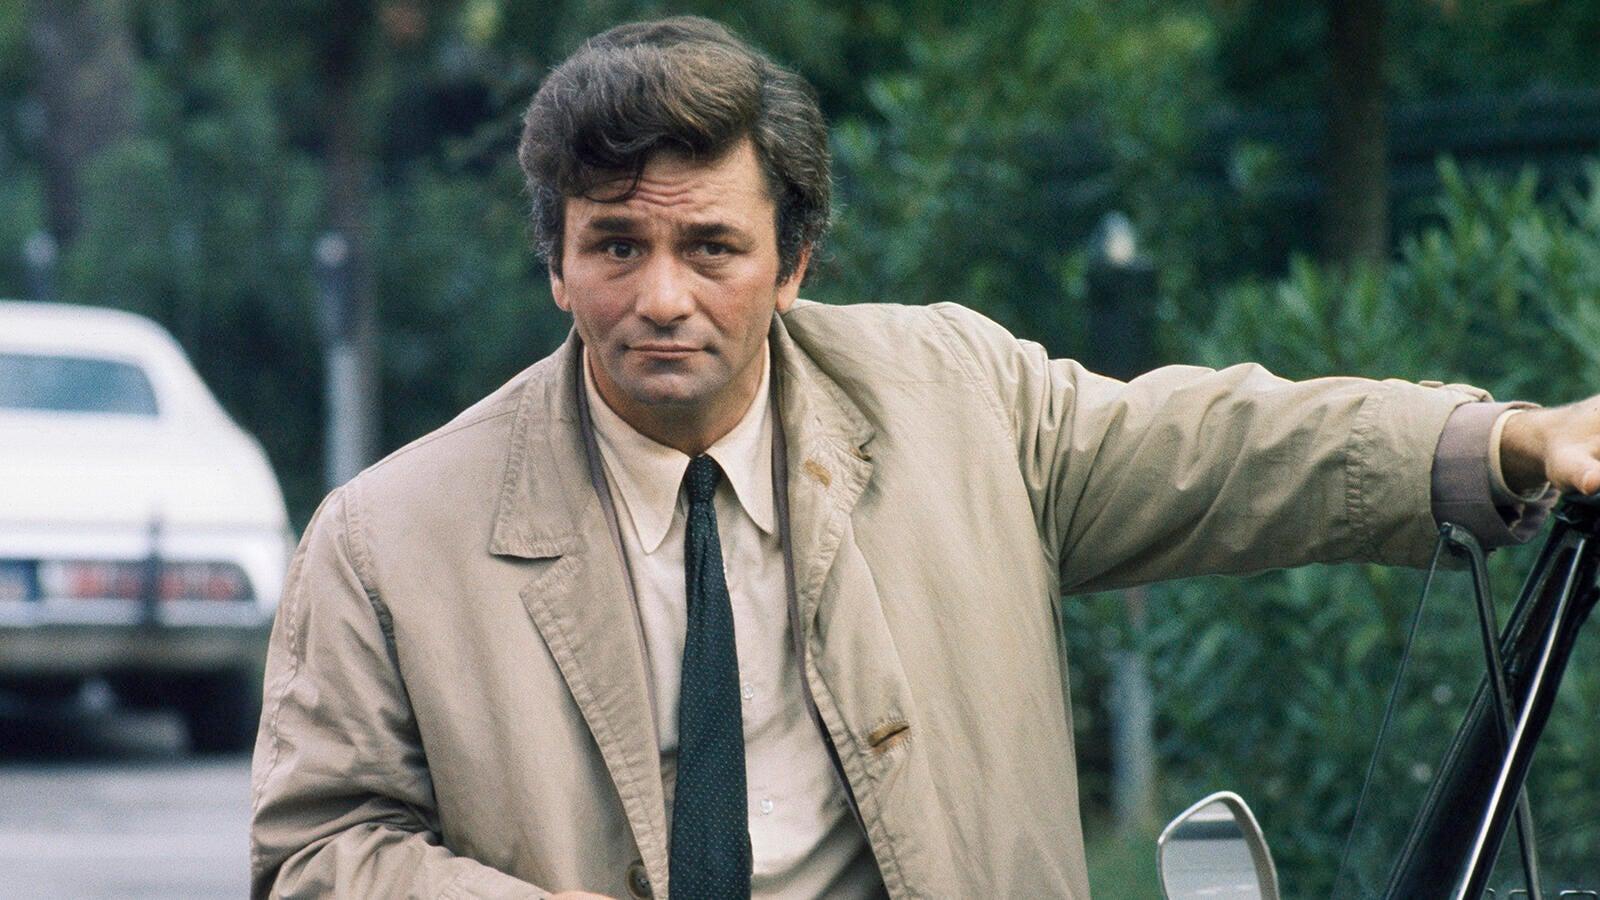 Peter Falk, Columbo